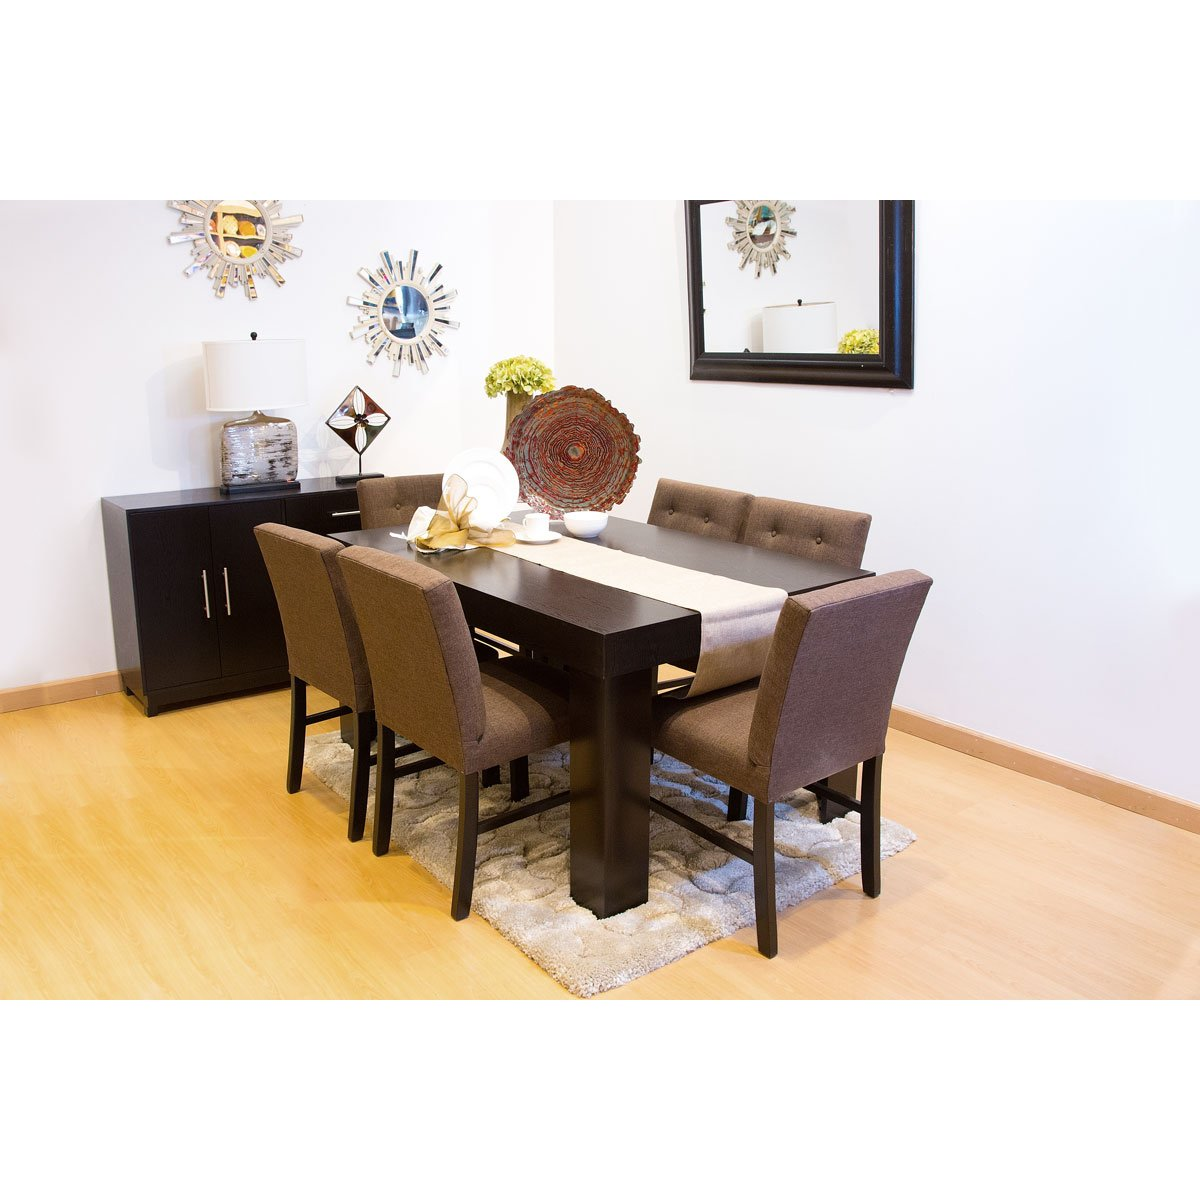 Ver Comedores Comedor Pedestal Yatinni Ver Detalles Muebles De  # Muebles Viu Comedores